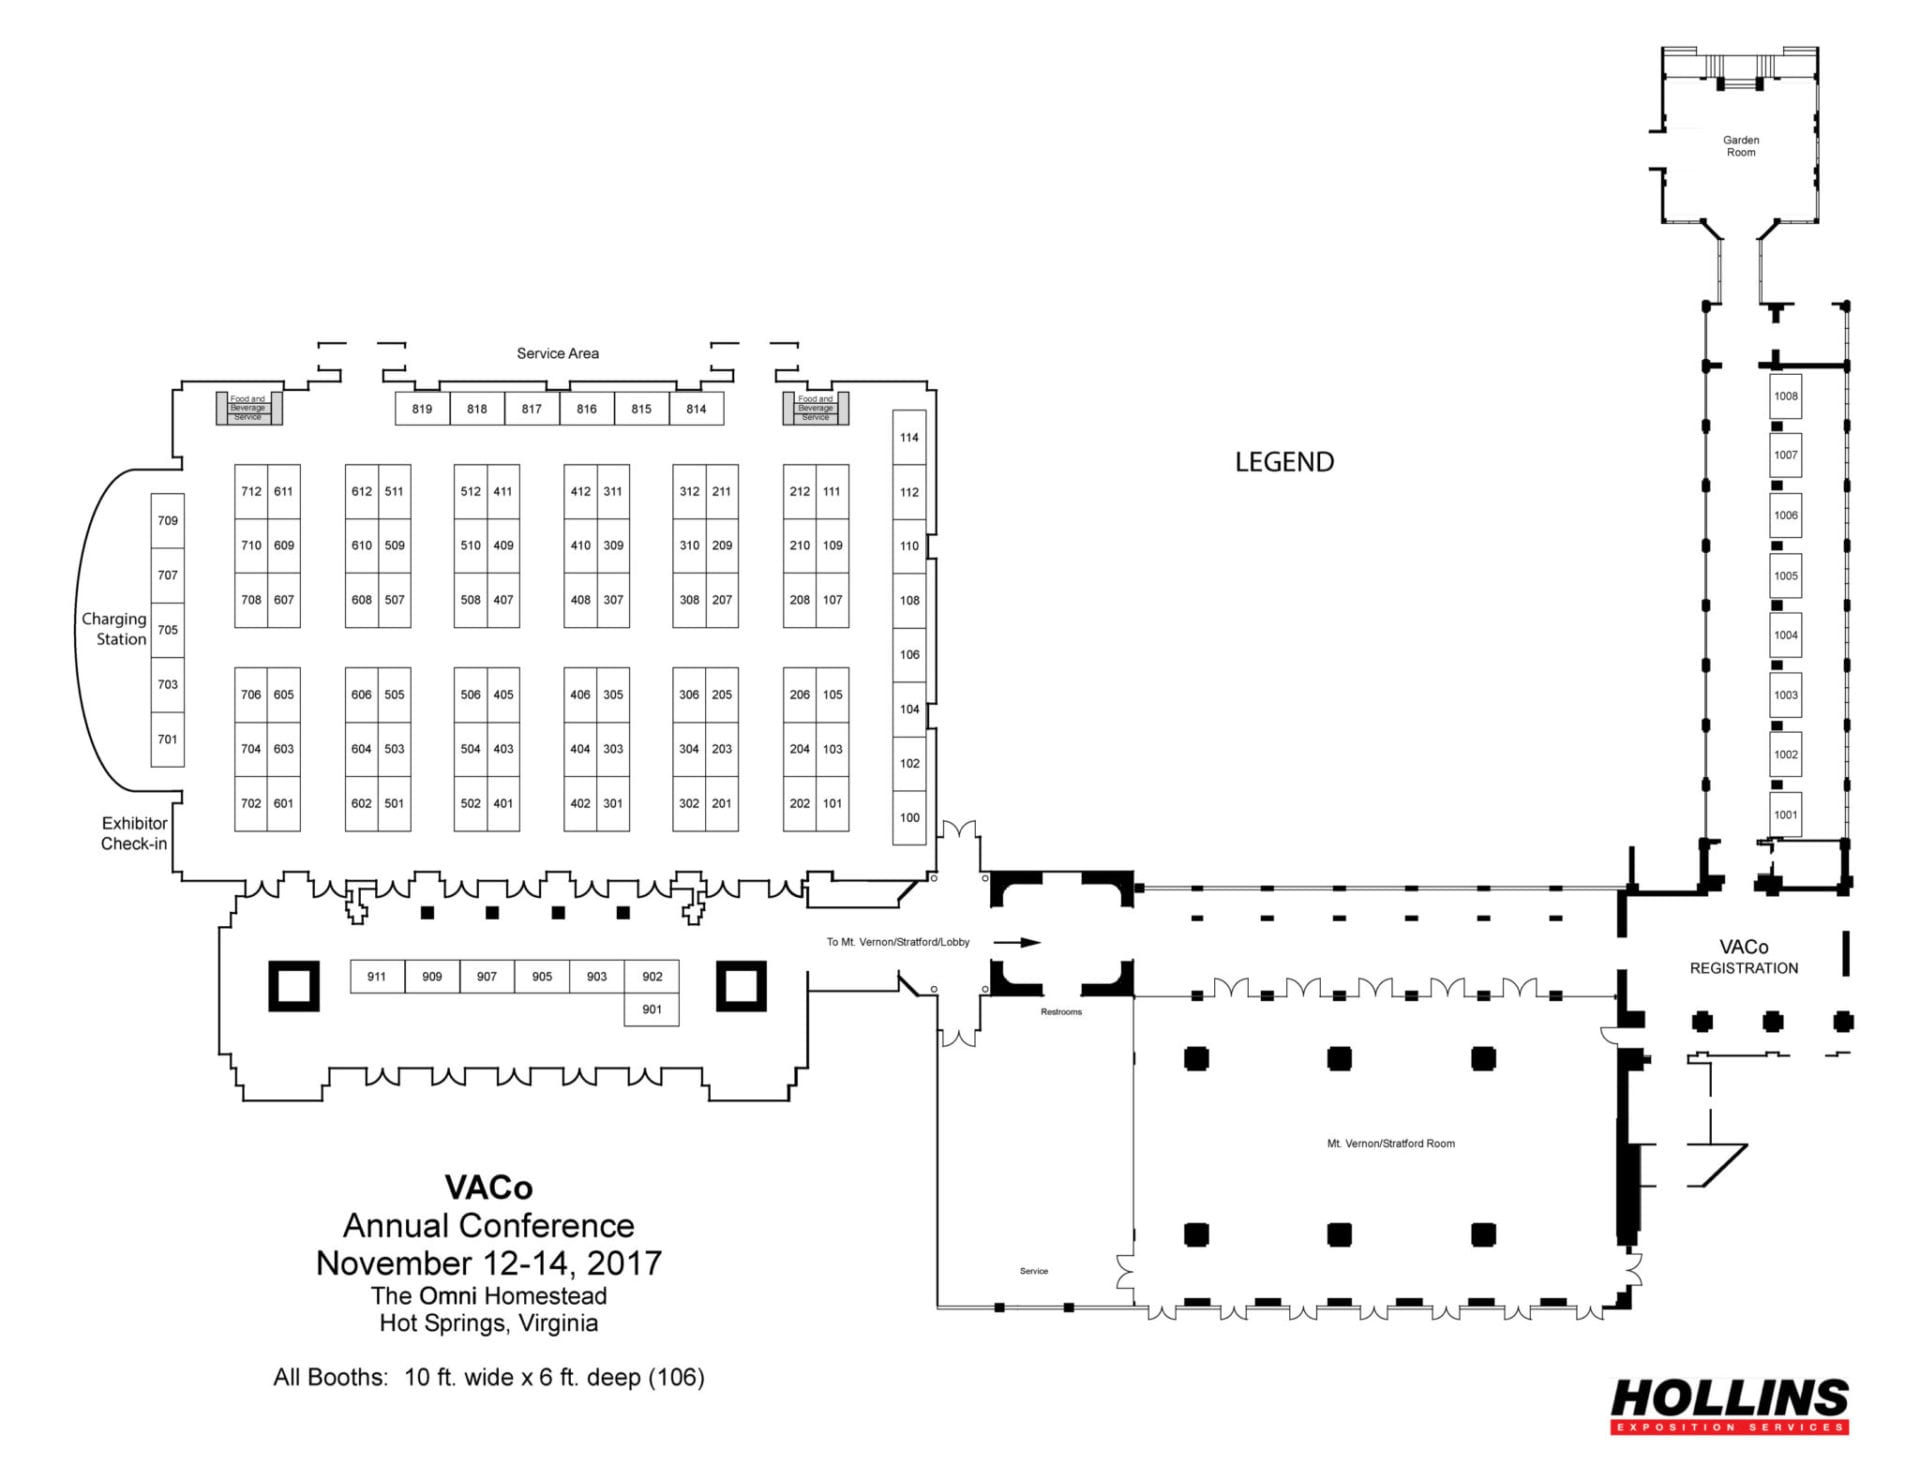 2017 Exhibit Hall – Interactive Map